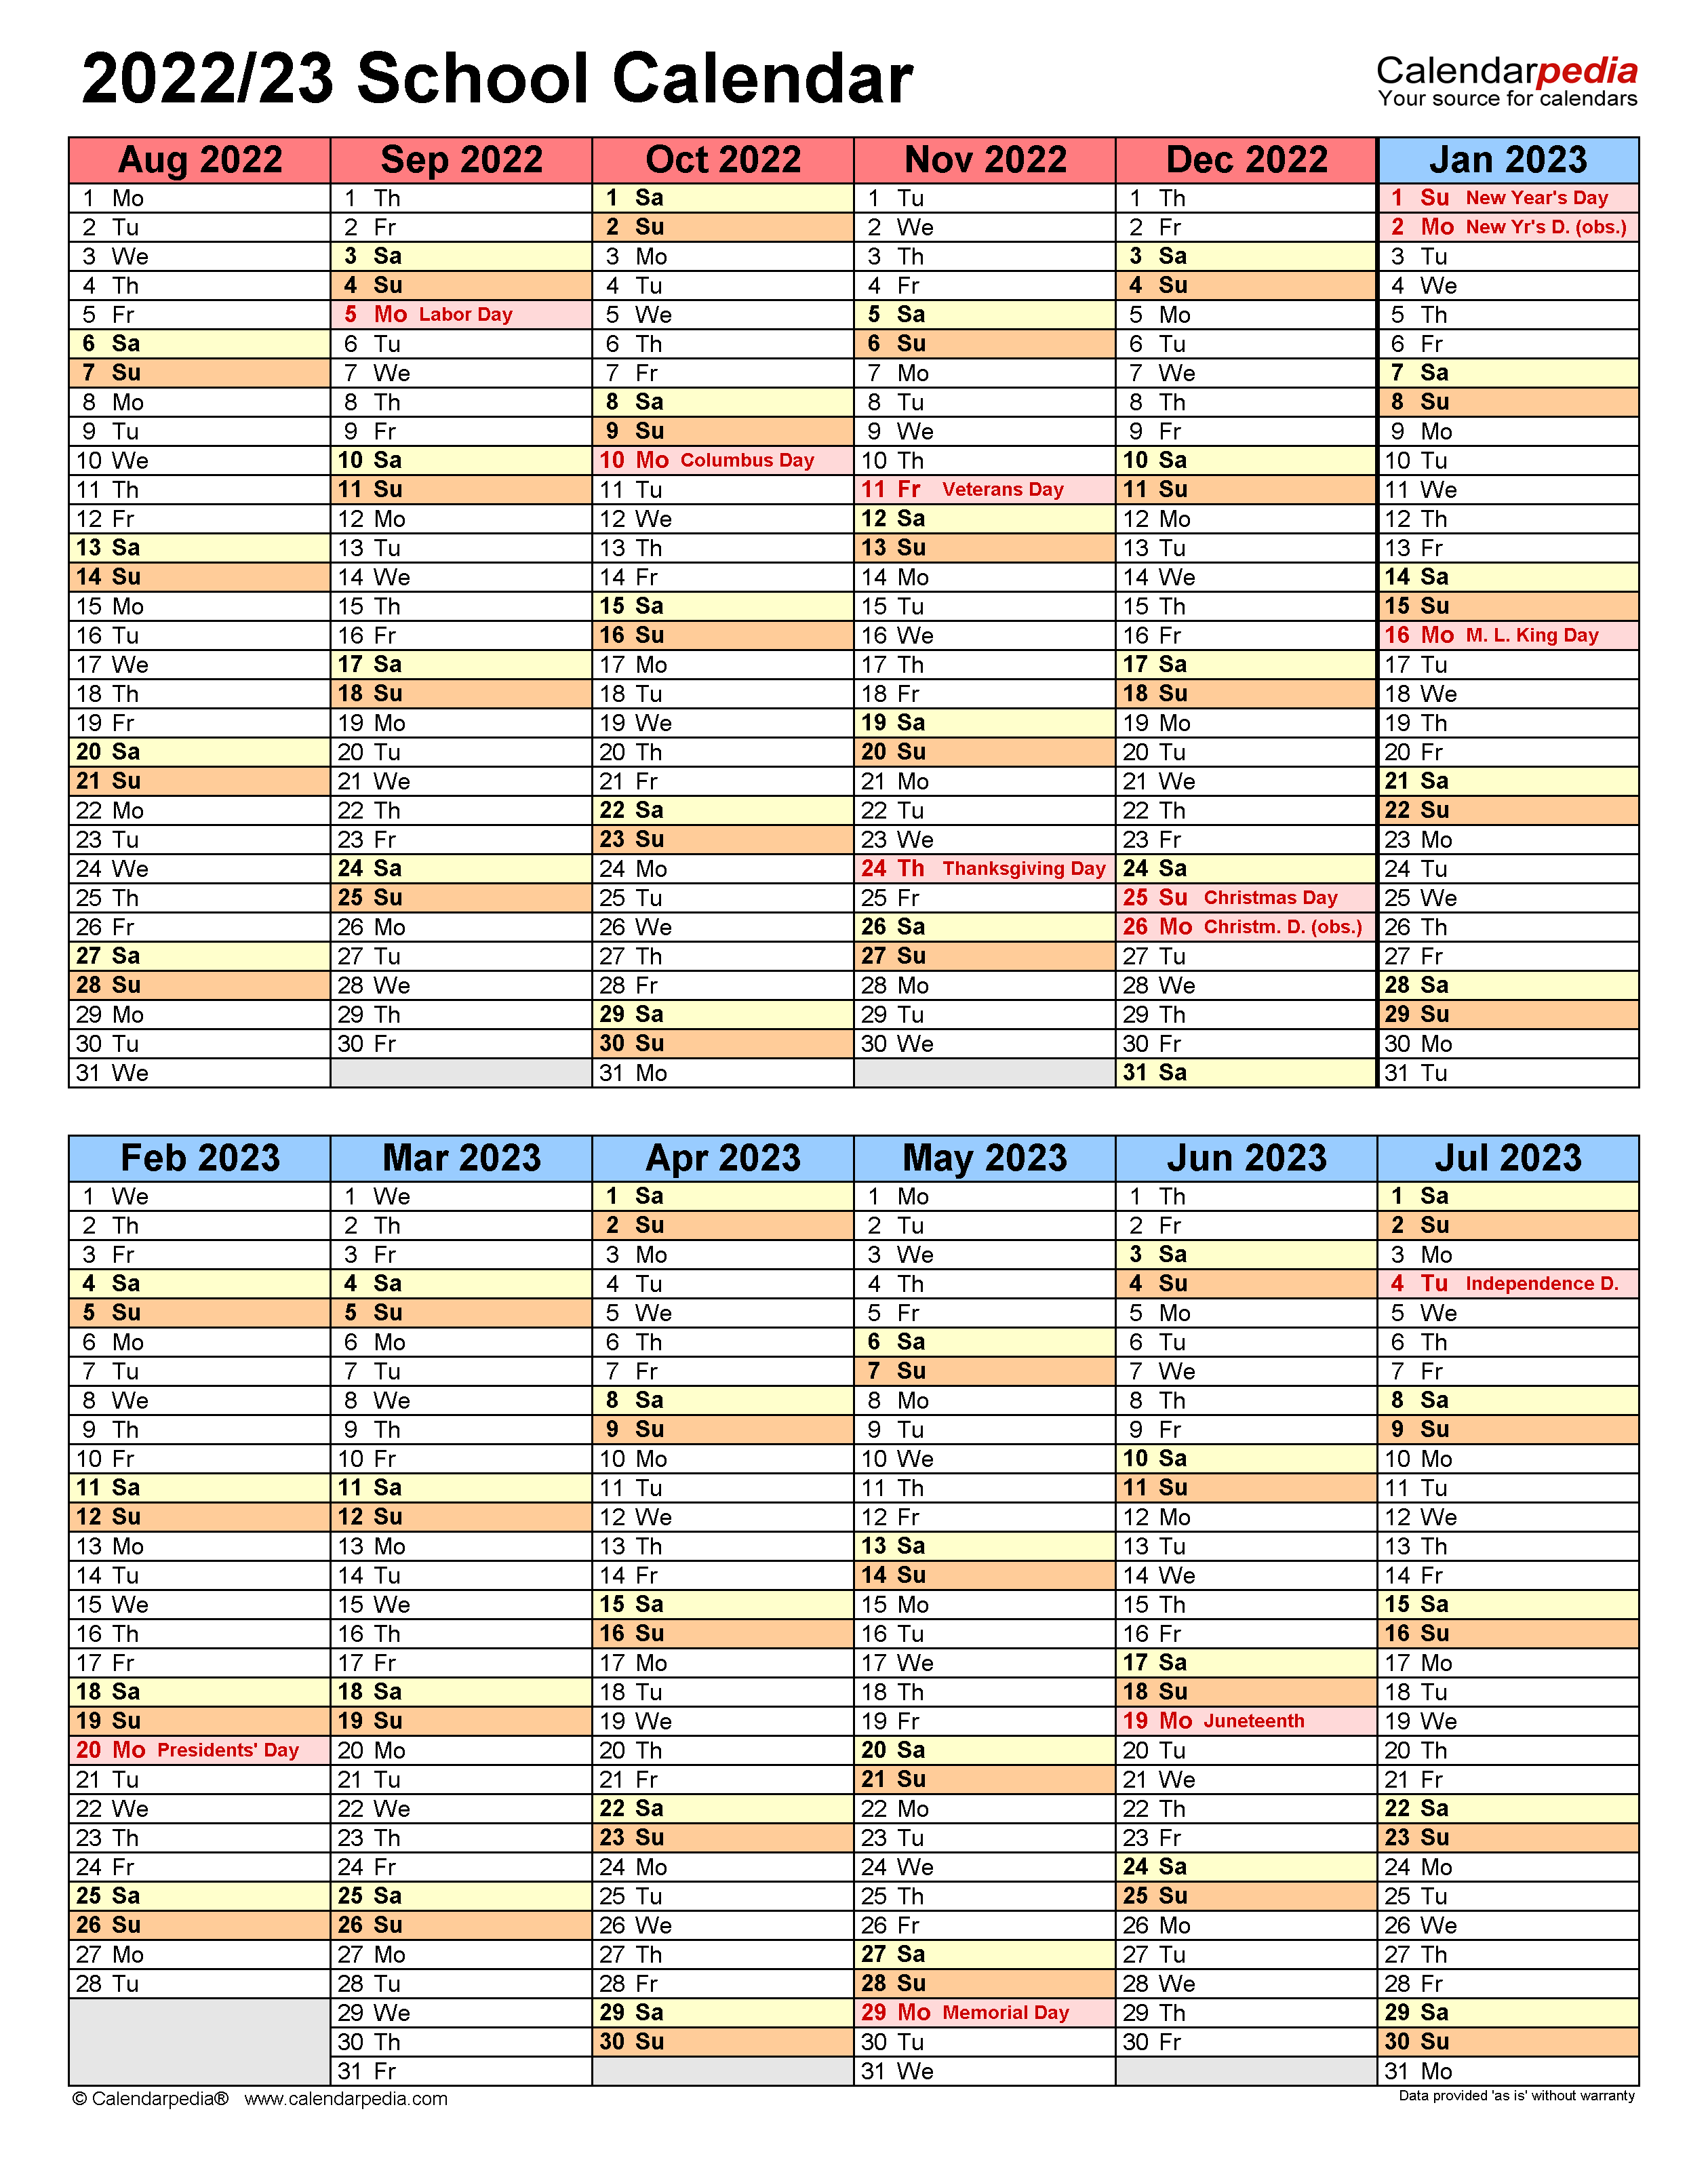 Ccps Calendar 2022 23.School Calendars 2022 2023 Free Printable Word Templates